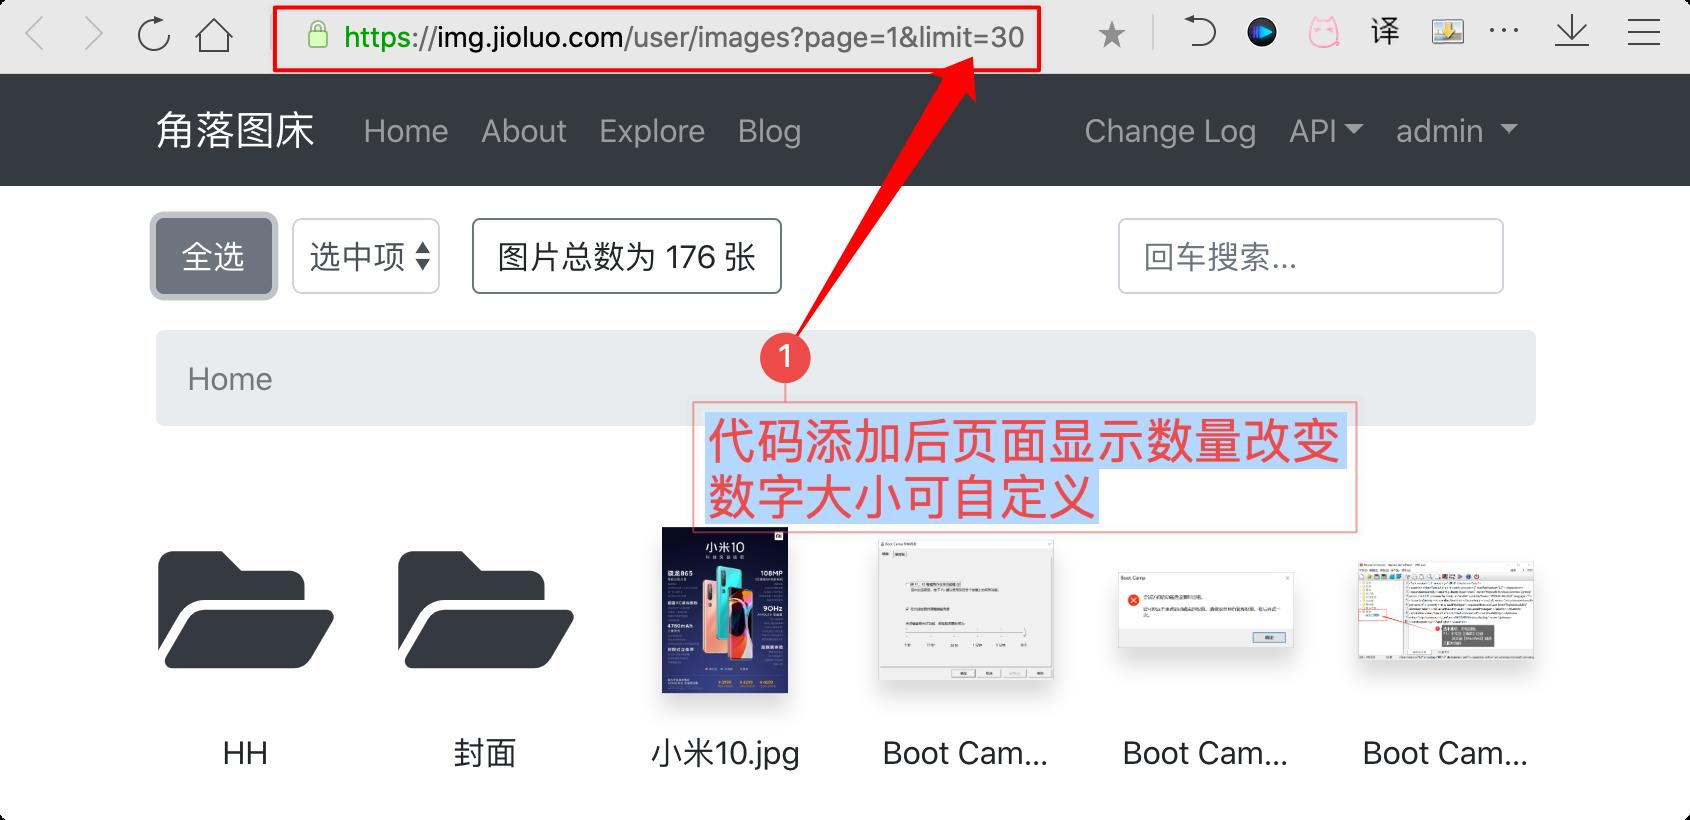 Hidove图床图库页面显示更多图片代码&limit=插图3